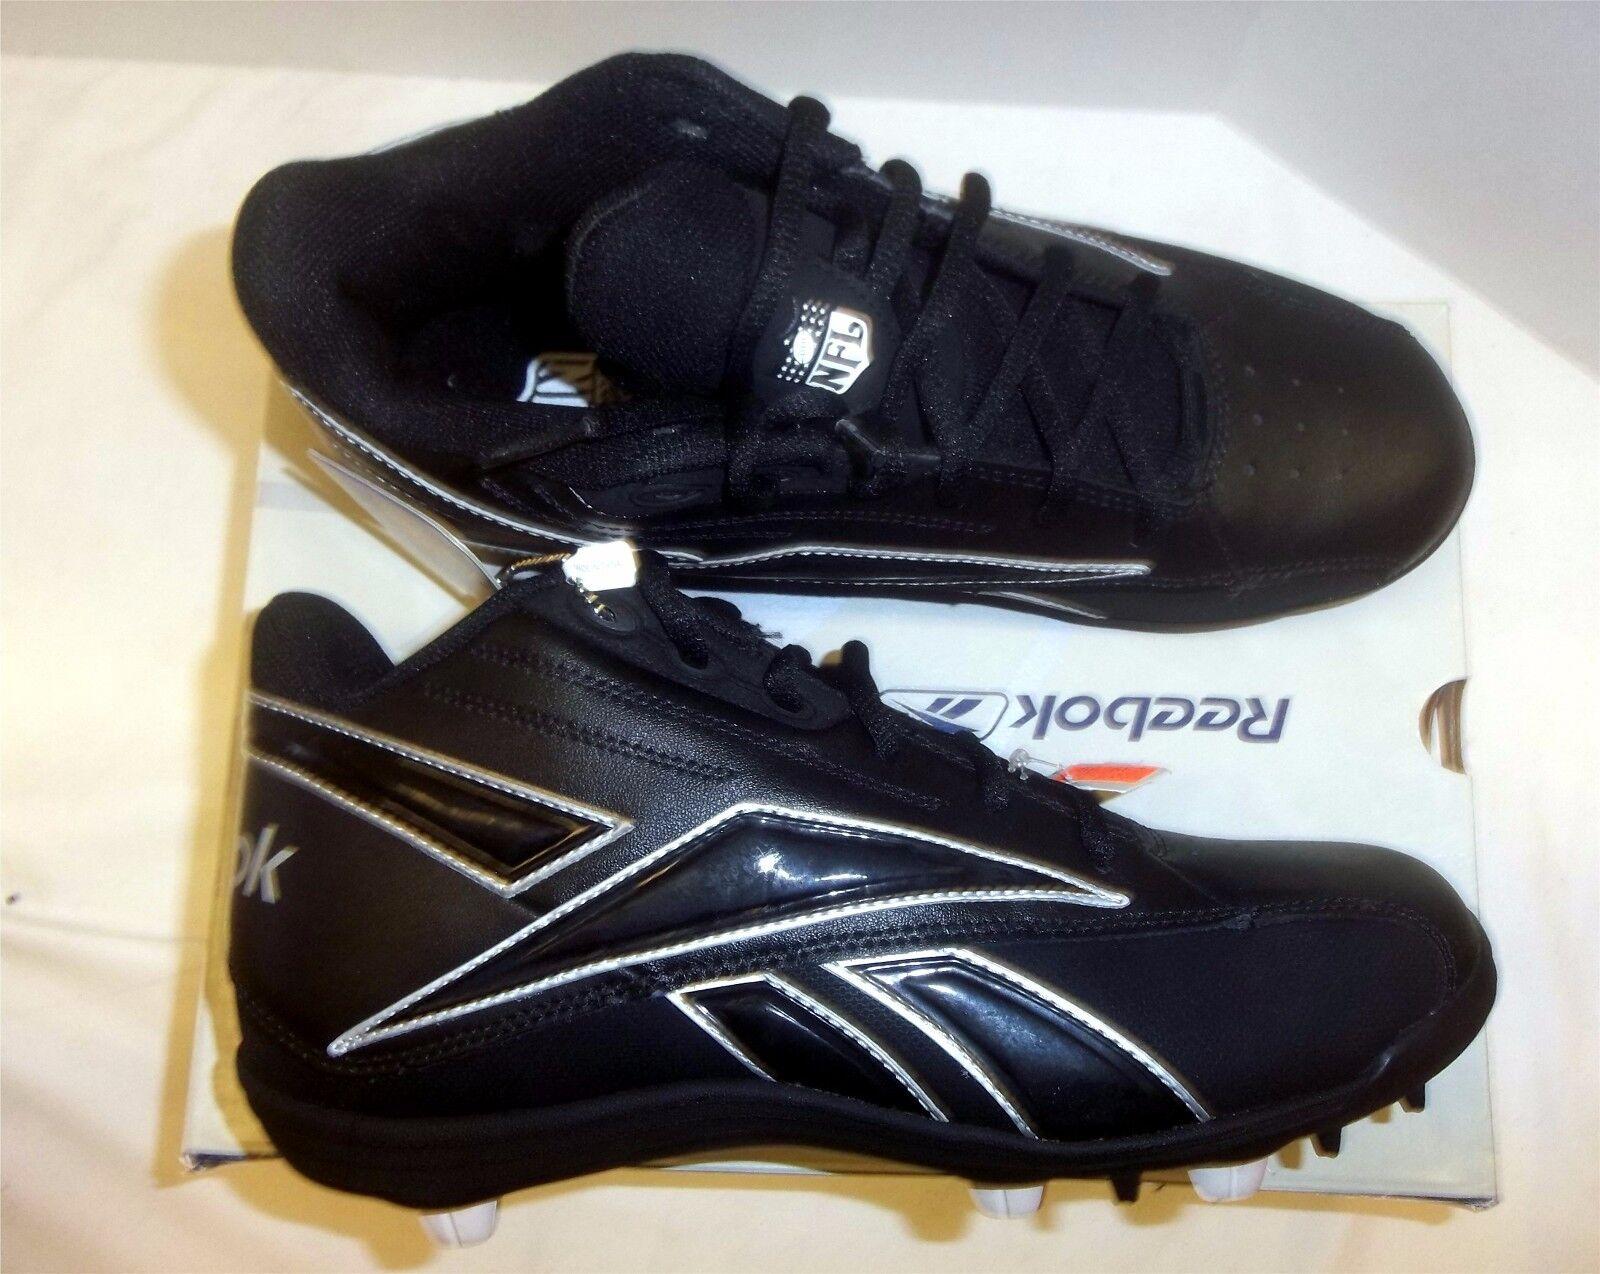 Top Sell - Reebok NFL Thorpe Mid MR7 Men's Football Cleats NIB Black/Black Size 15